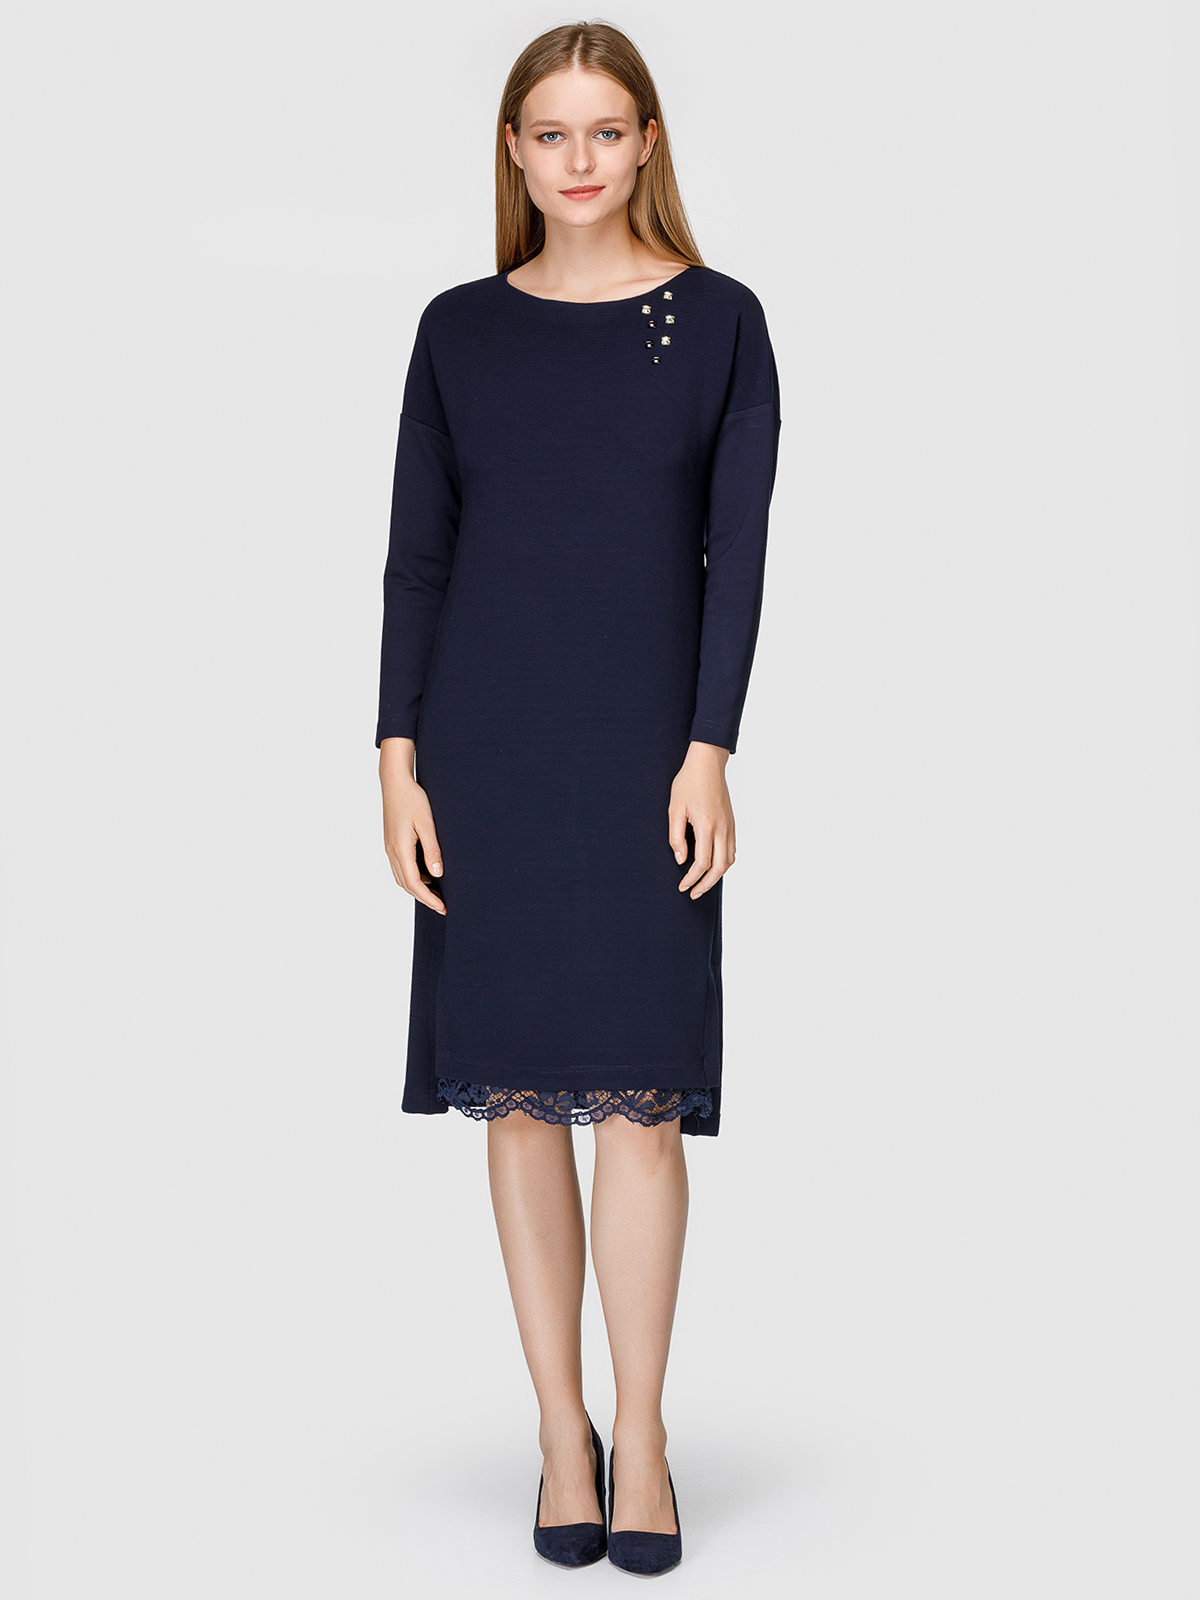 Платье женское Helmidge 7501 синее 26 UK фото